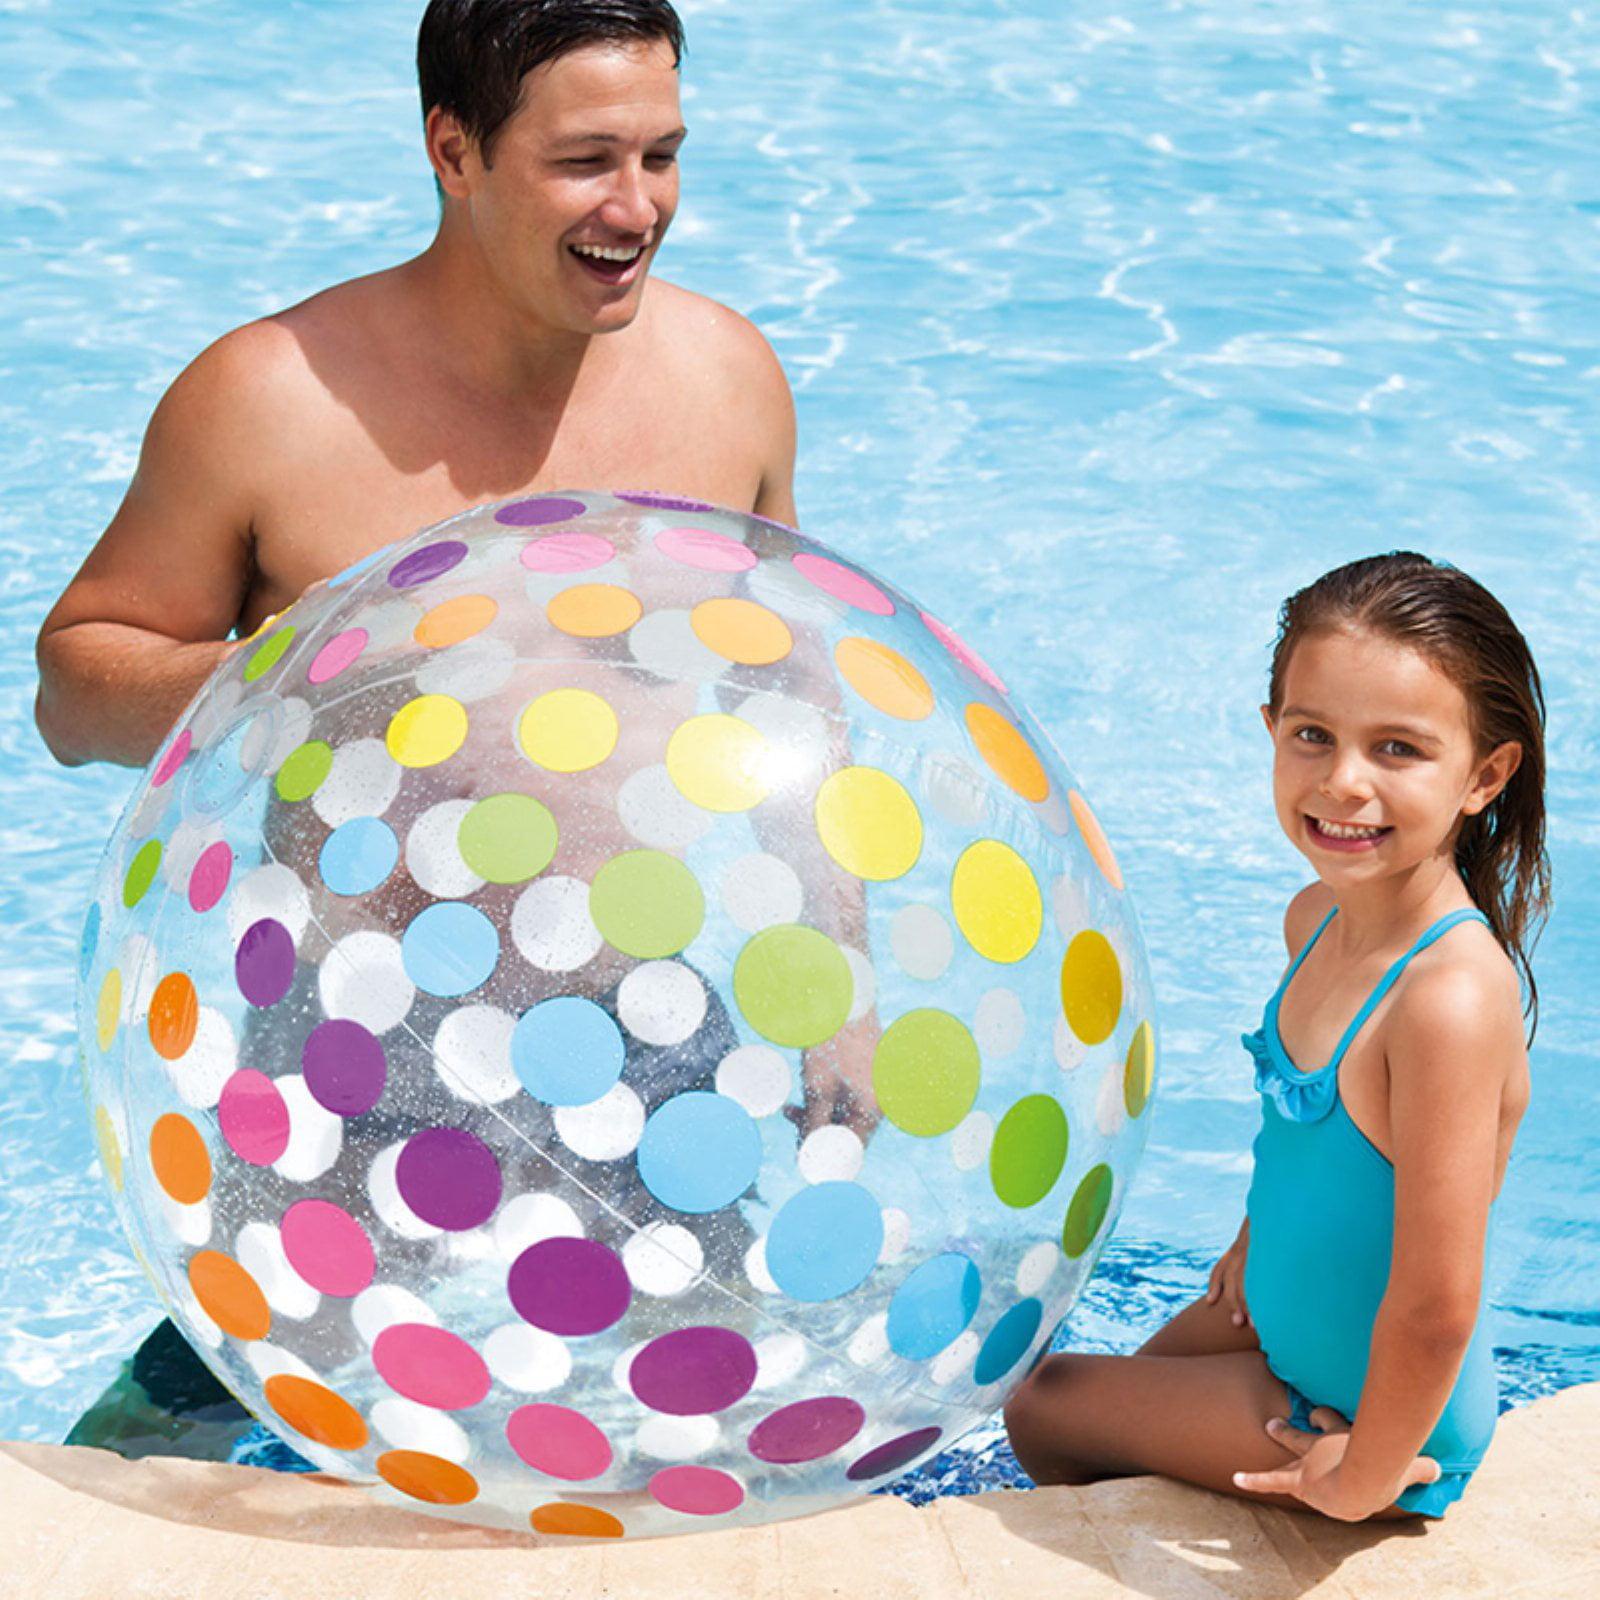 Intex Jumbo Inflatable Glossy Big Polka-Dot Colorful Giant Beach Ball   59065EP by Intex